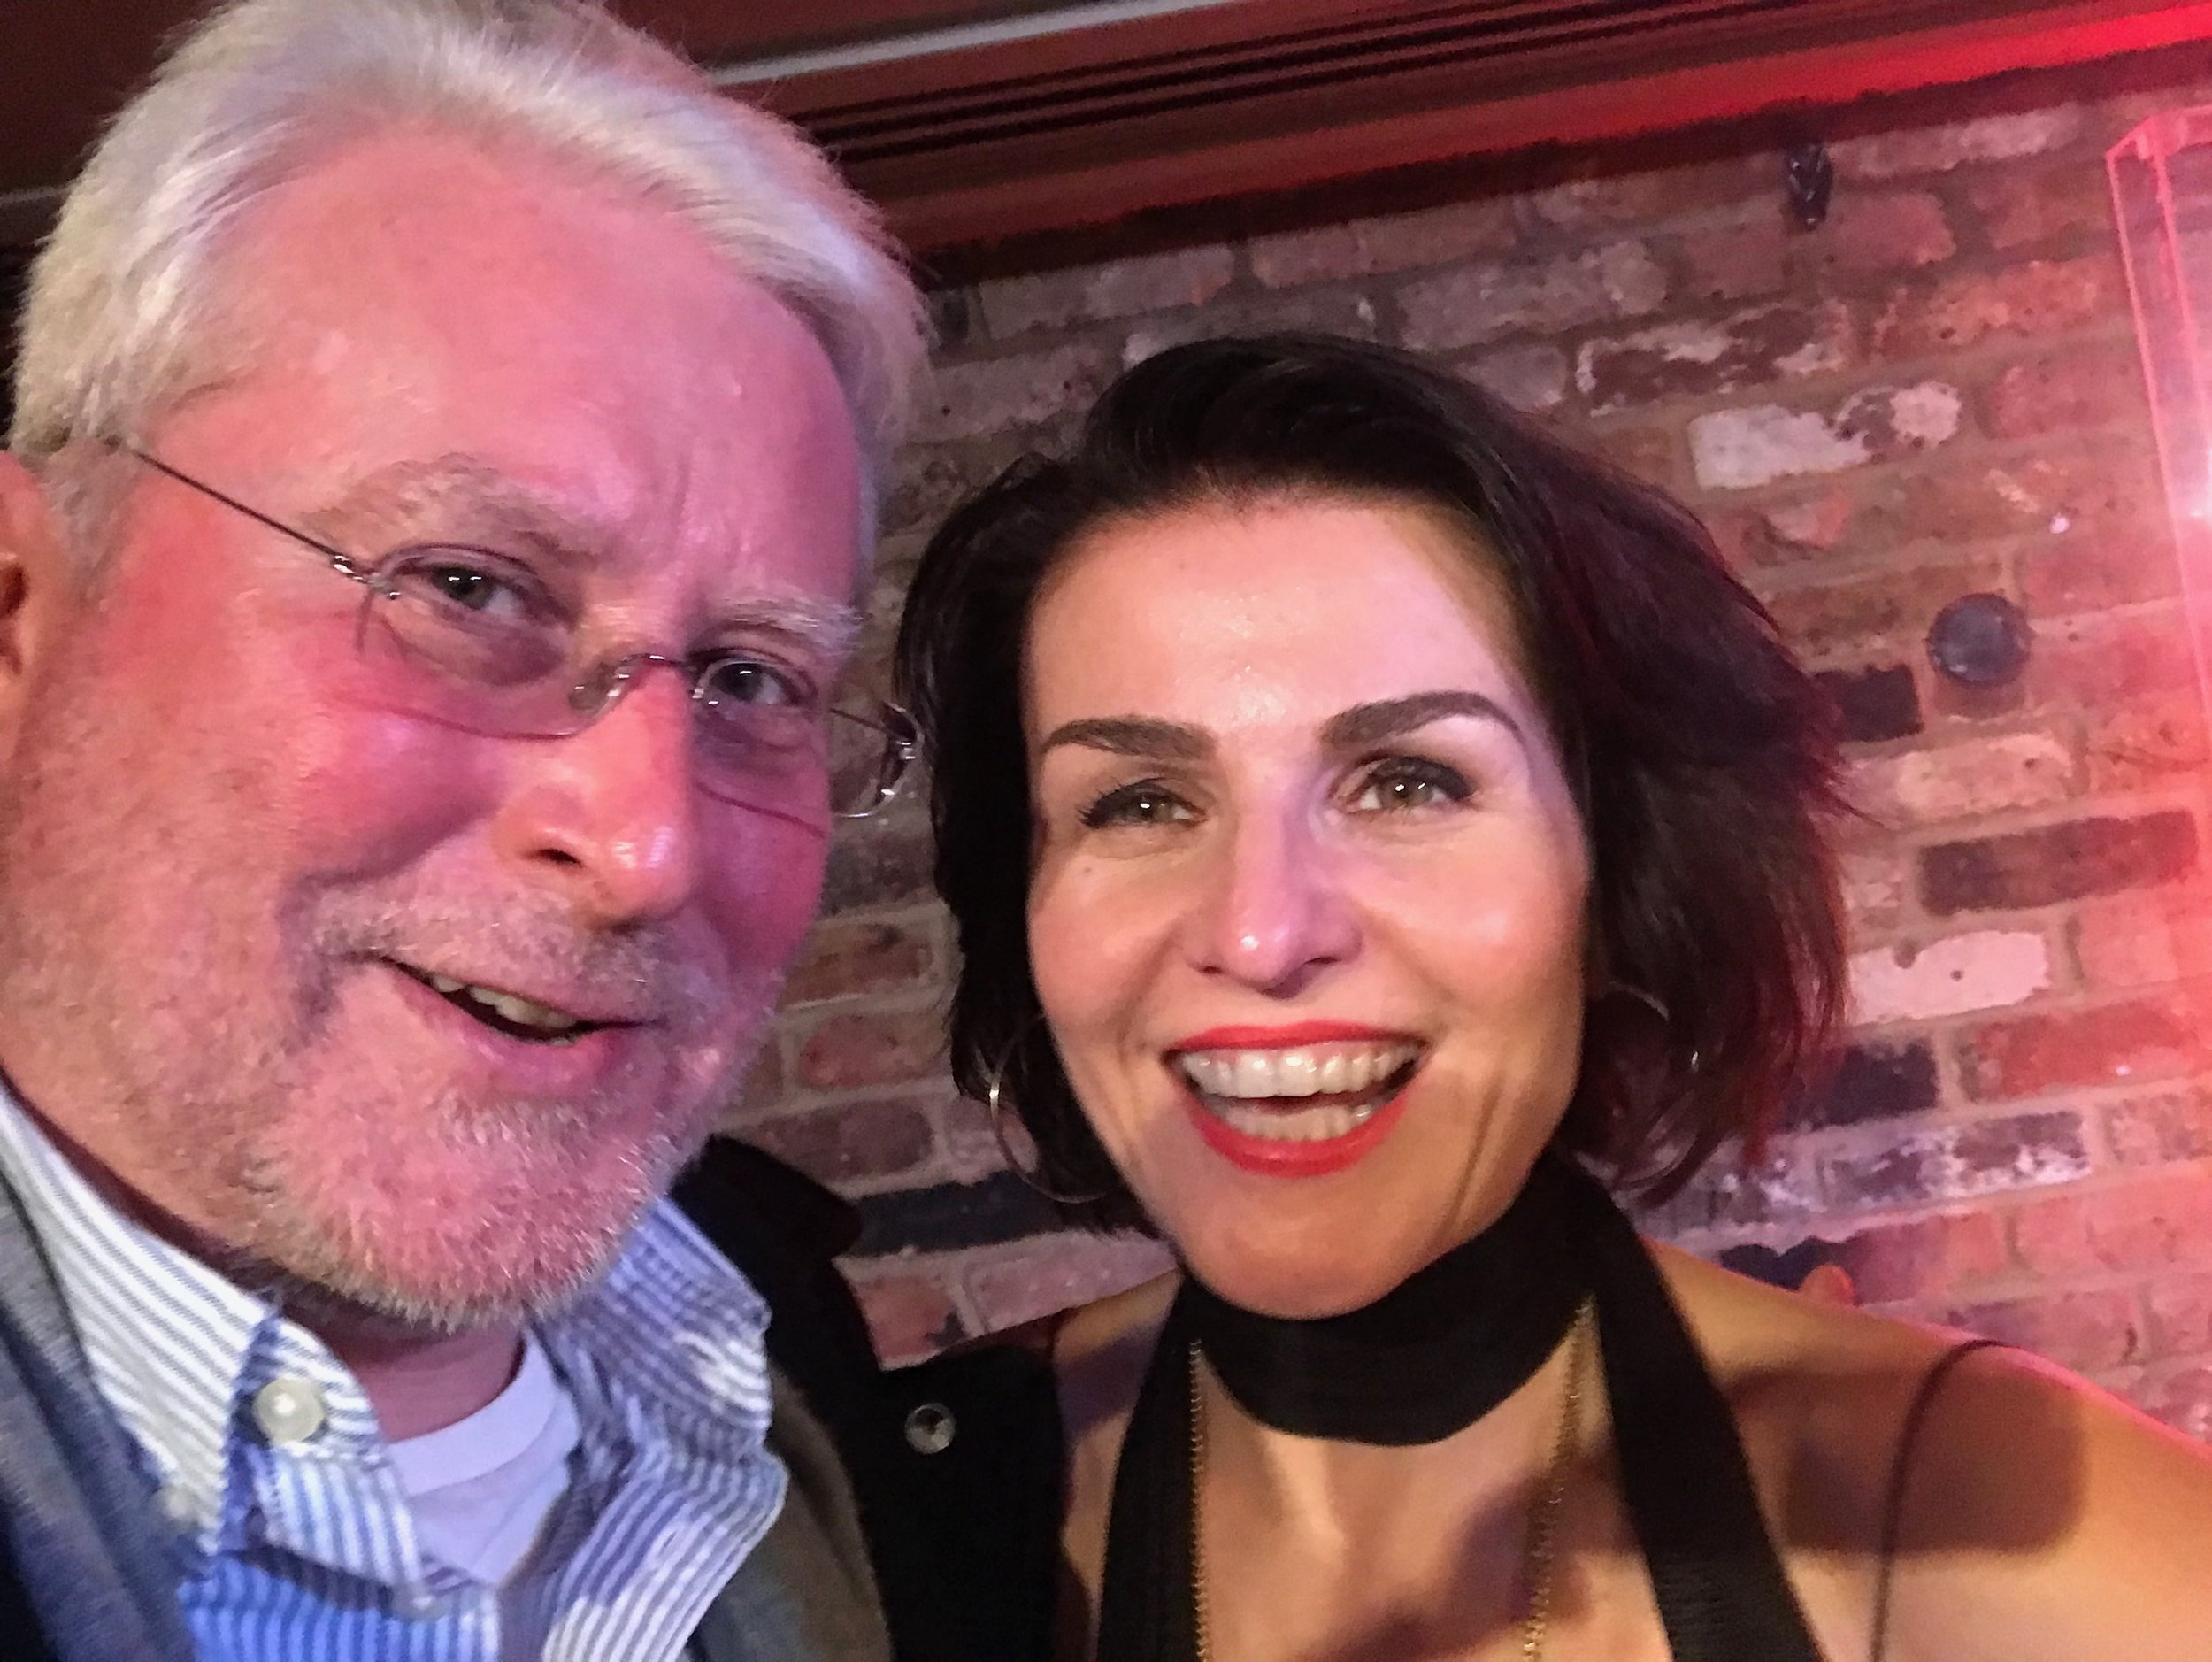 Martin Hummel and Alina Bzhezhinska.